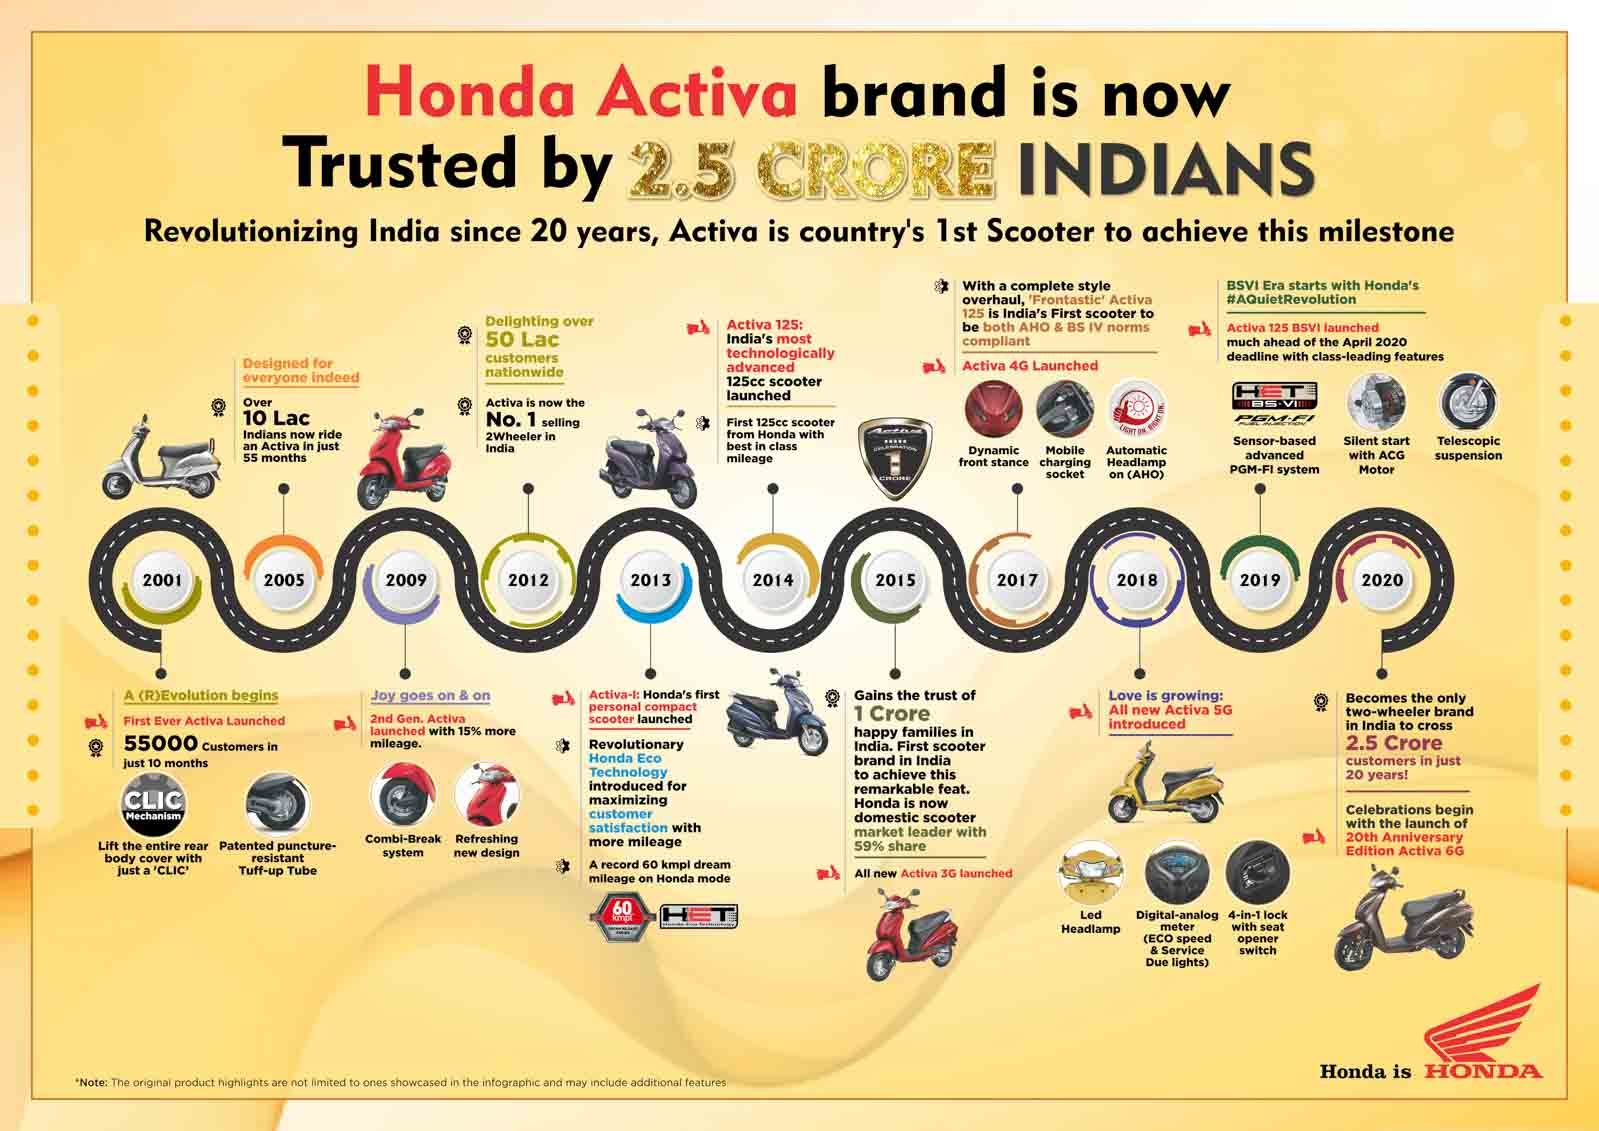 Infographic_Activa Brand creates history with 2.5 Crore customers